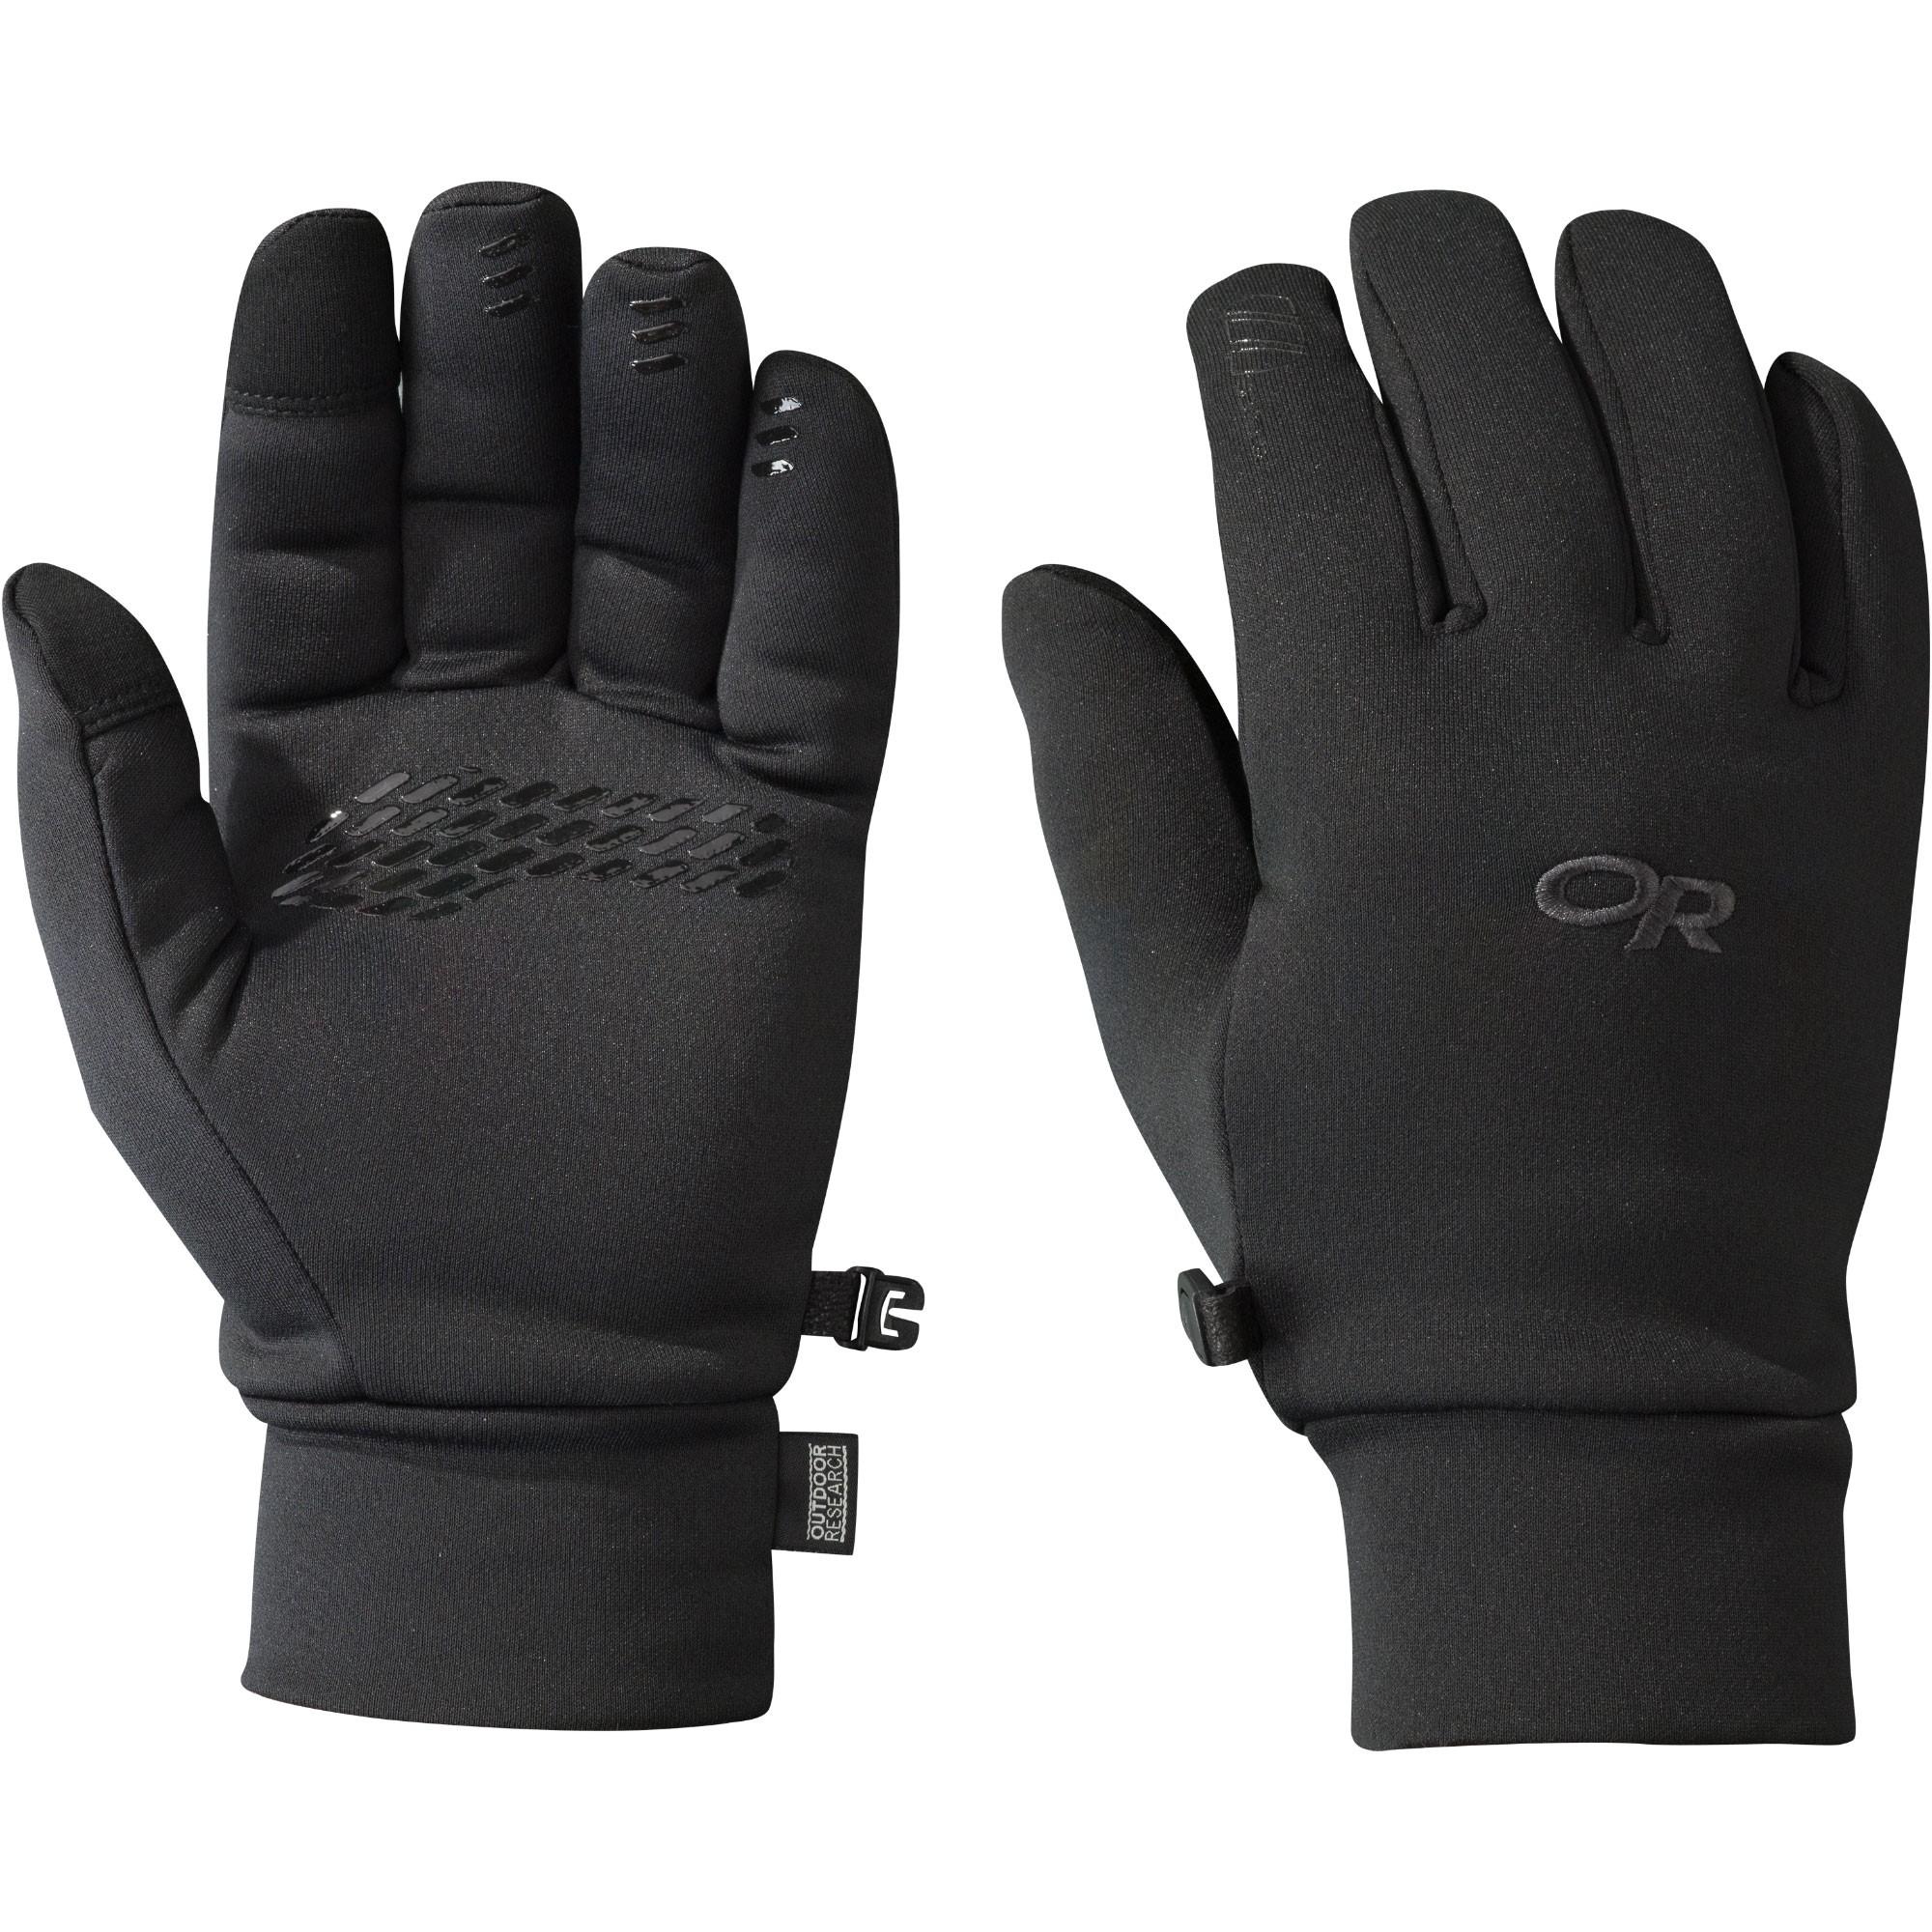 Outdoor-Research-PL-400-Sensor-Glove-Mens-Black-W17